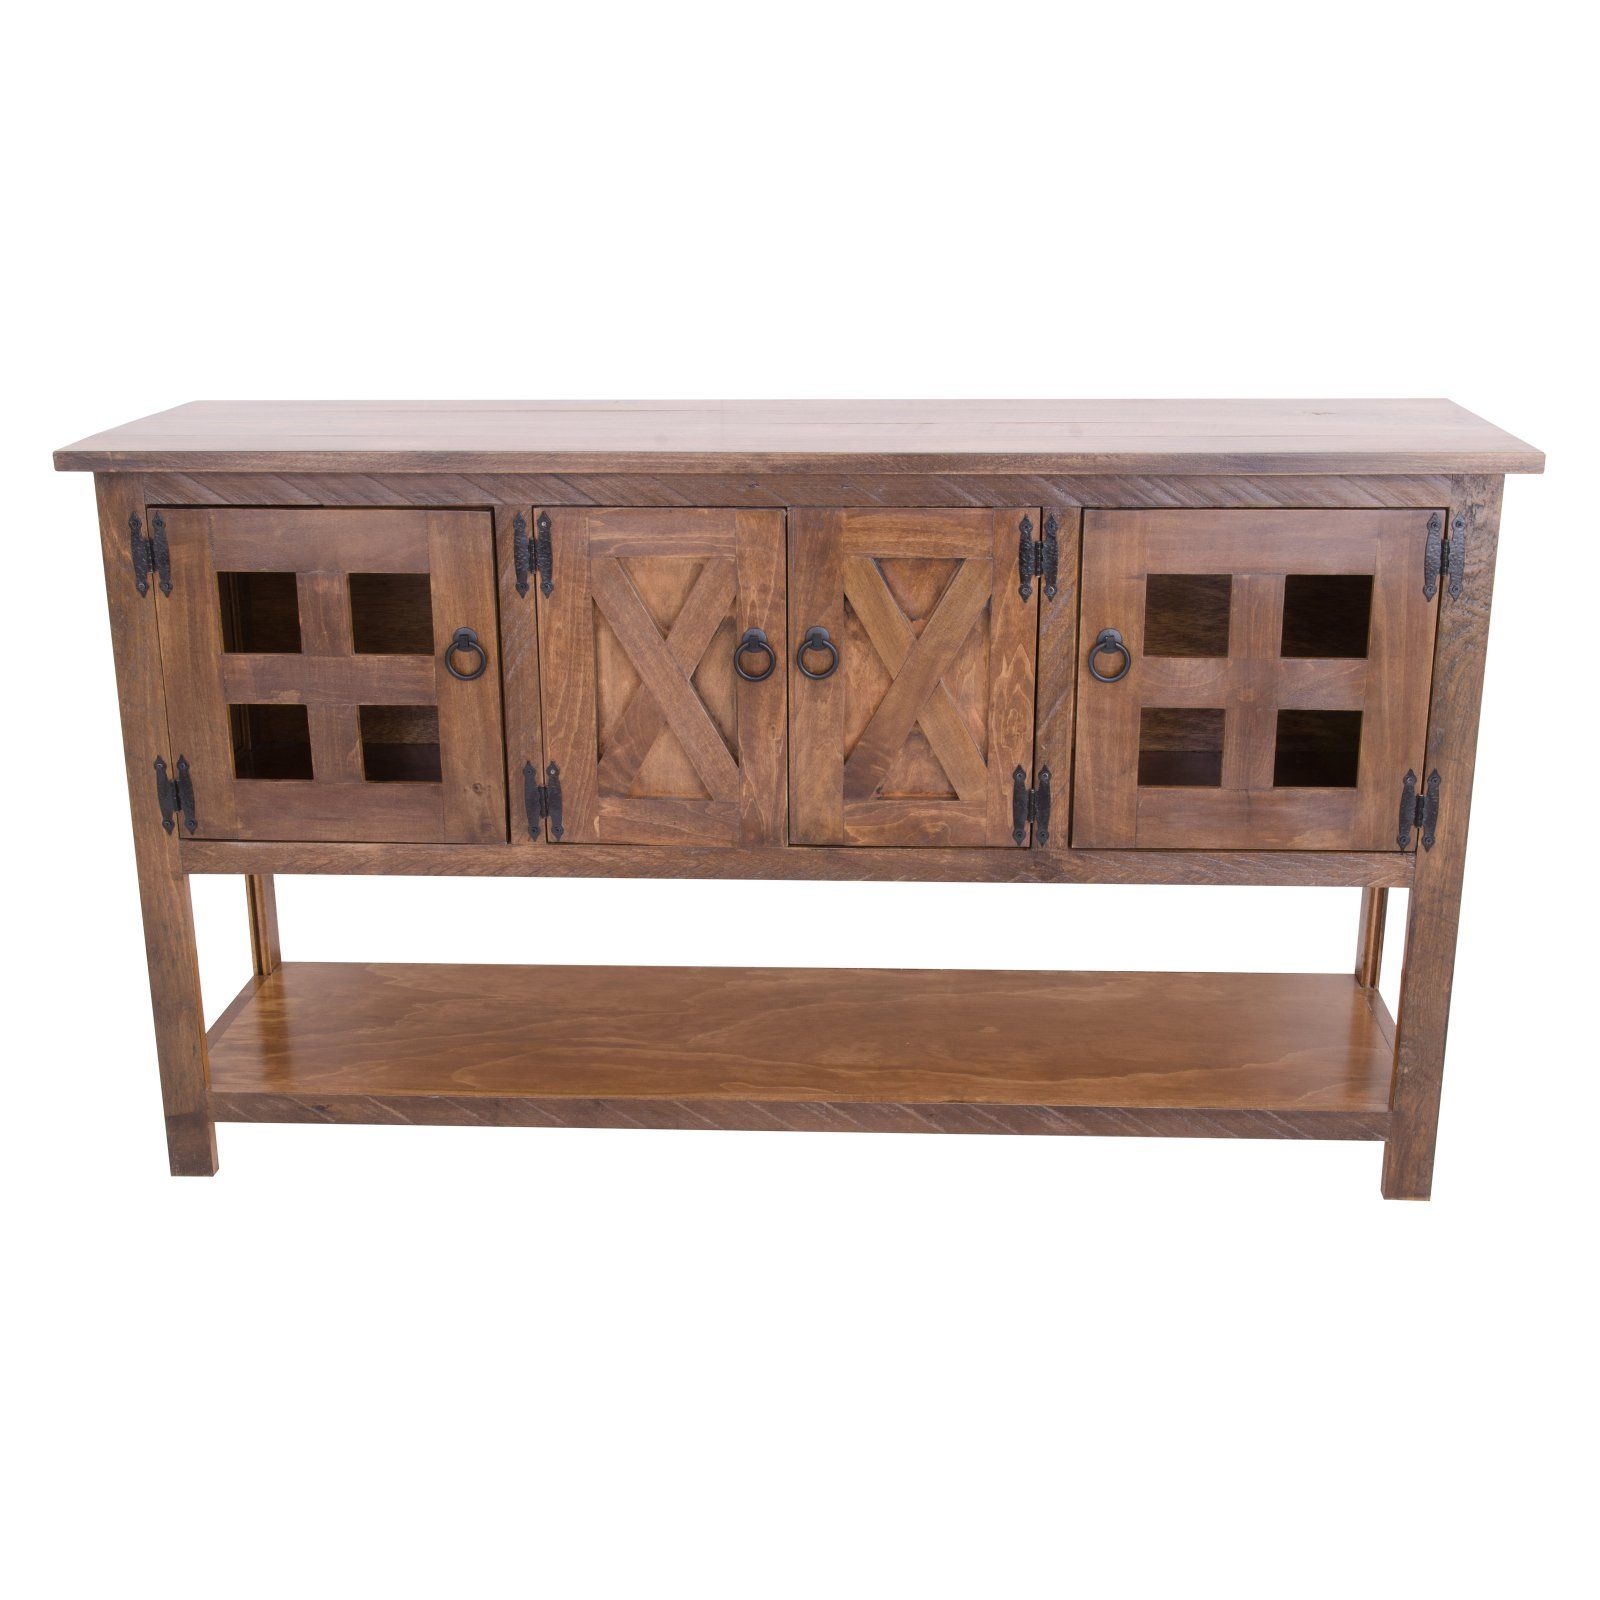 Eagle Furniture Farm House Sofa Table Products In 2019